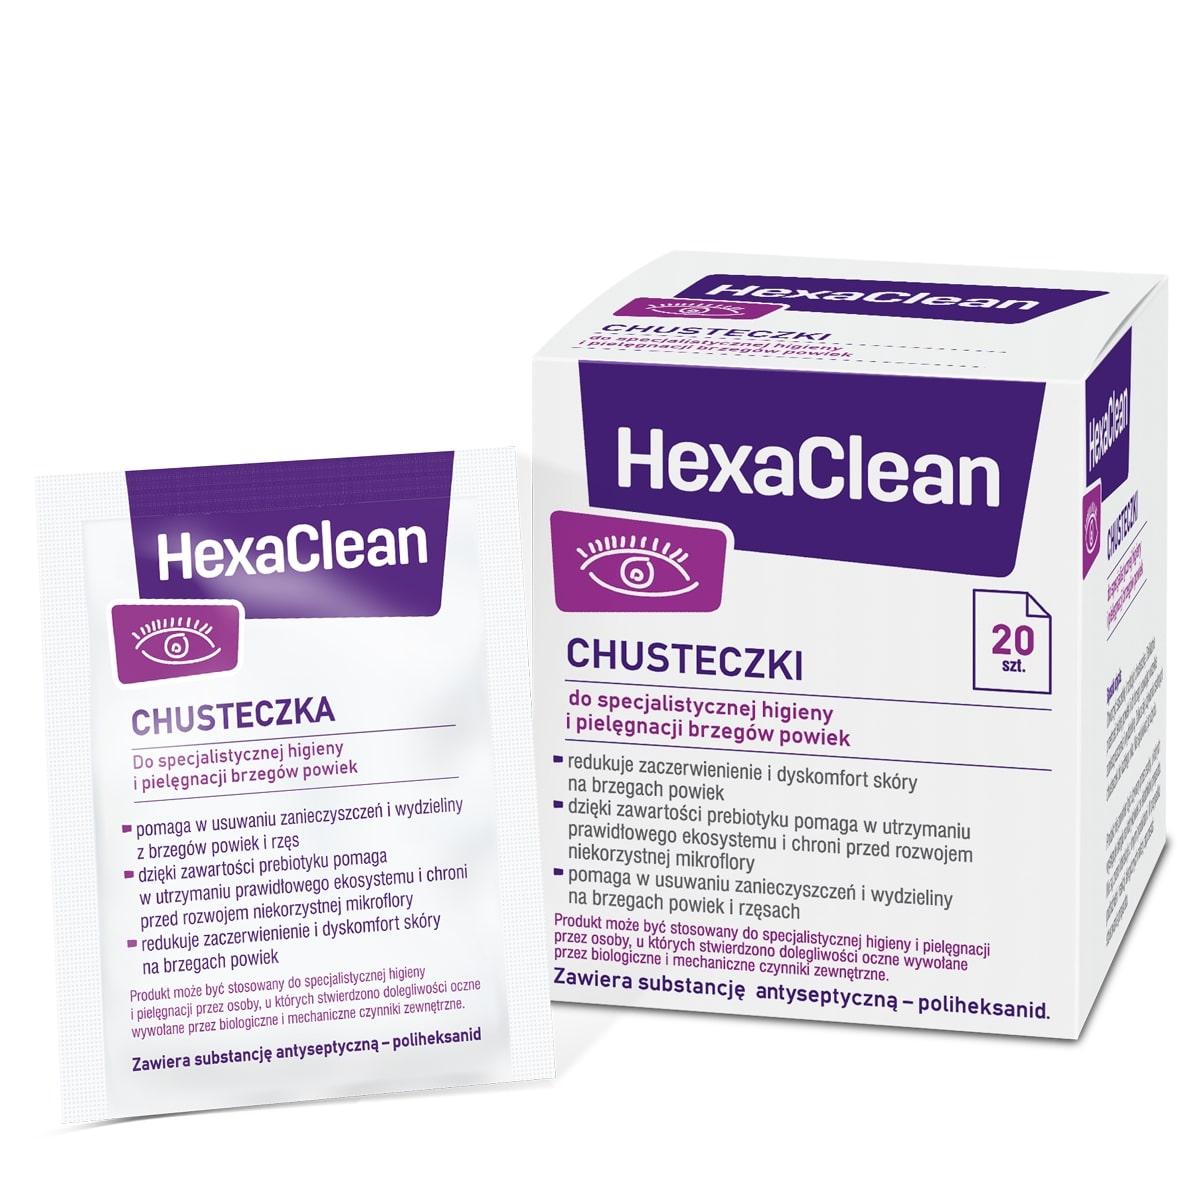 HexaClean